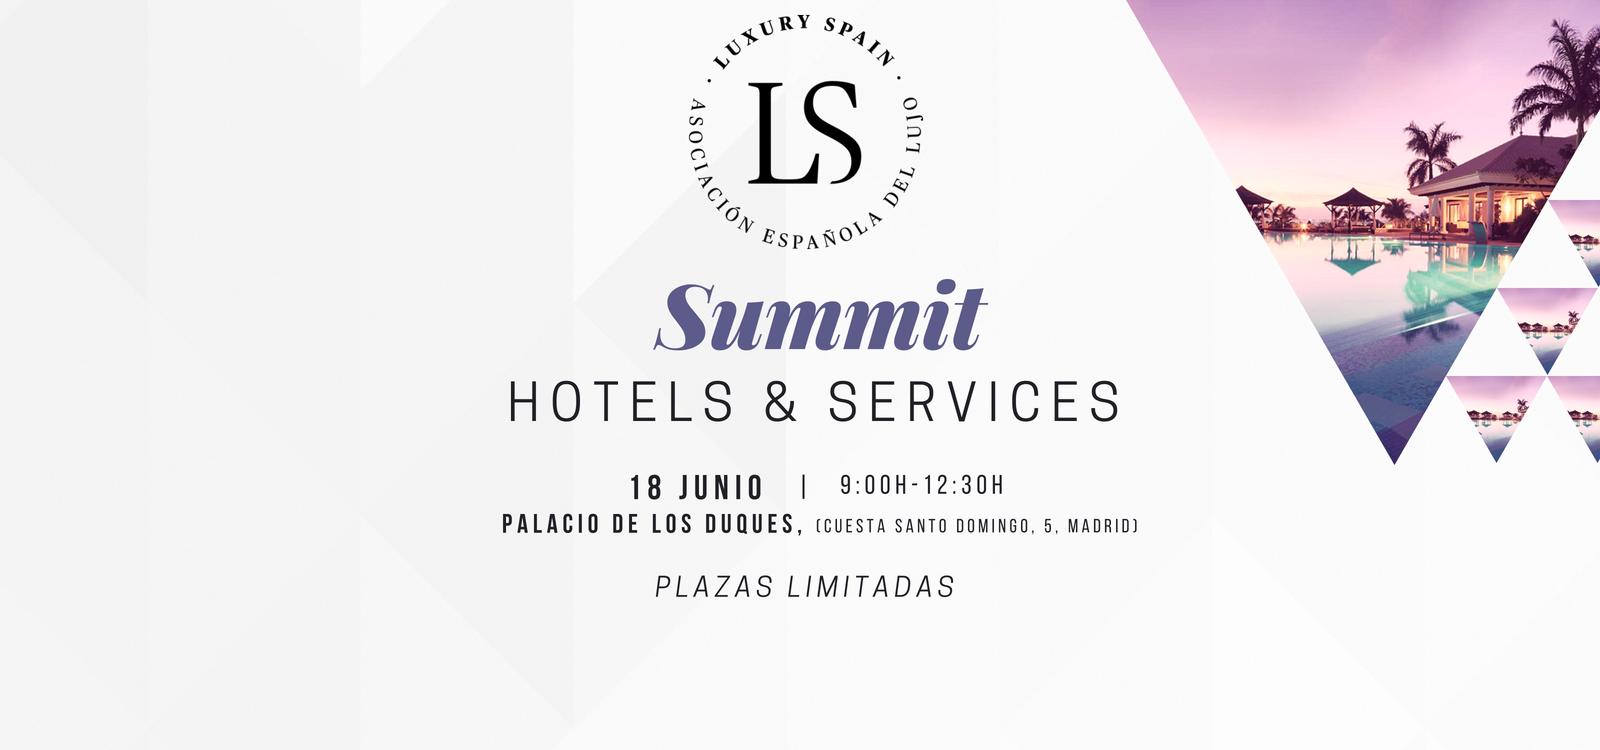 Luxury Spain Hotels & Services Summit